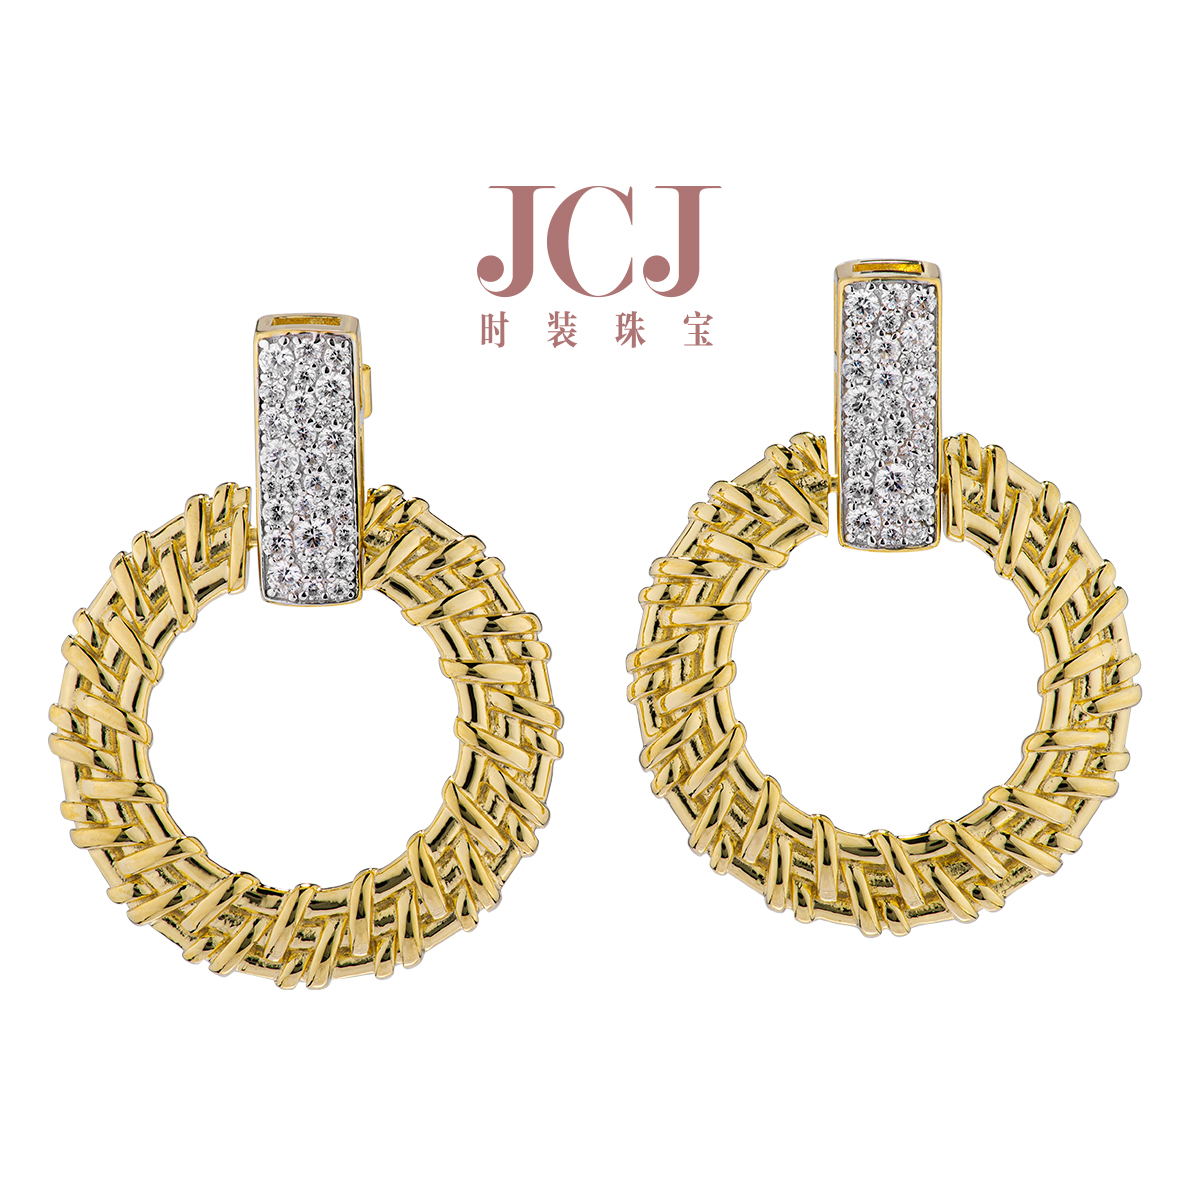 JCJ时装珠宝 HighJewelPlay系列银镀金锆石编织环状经典圆耳环